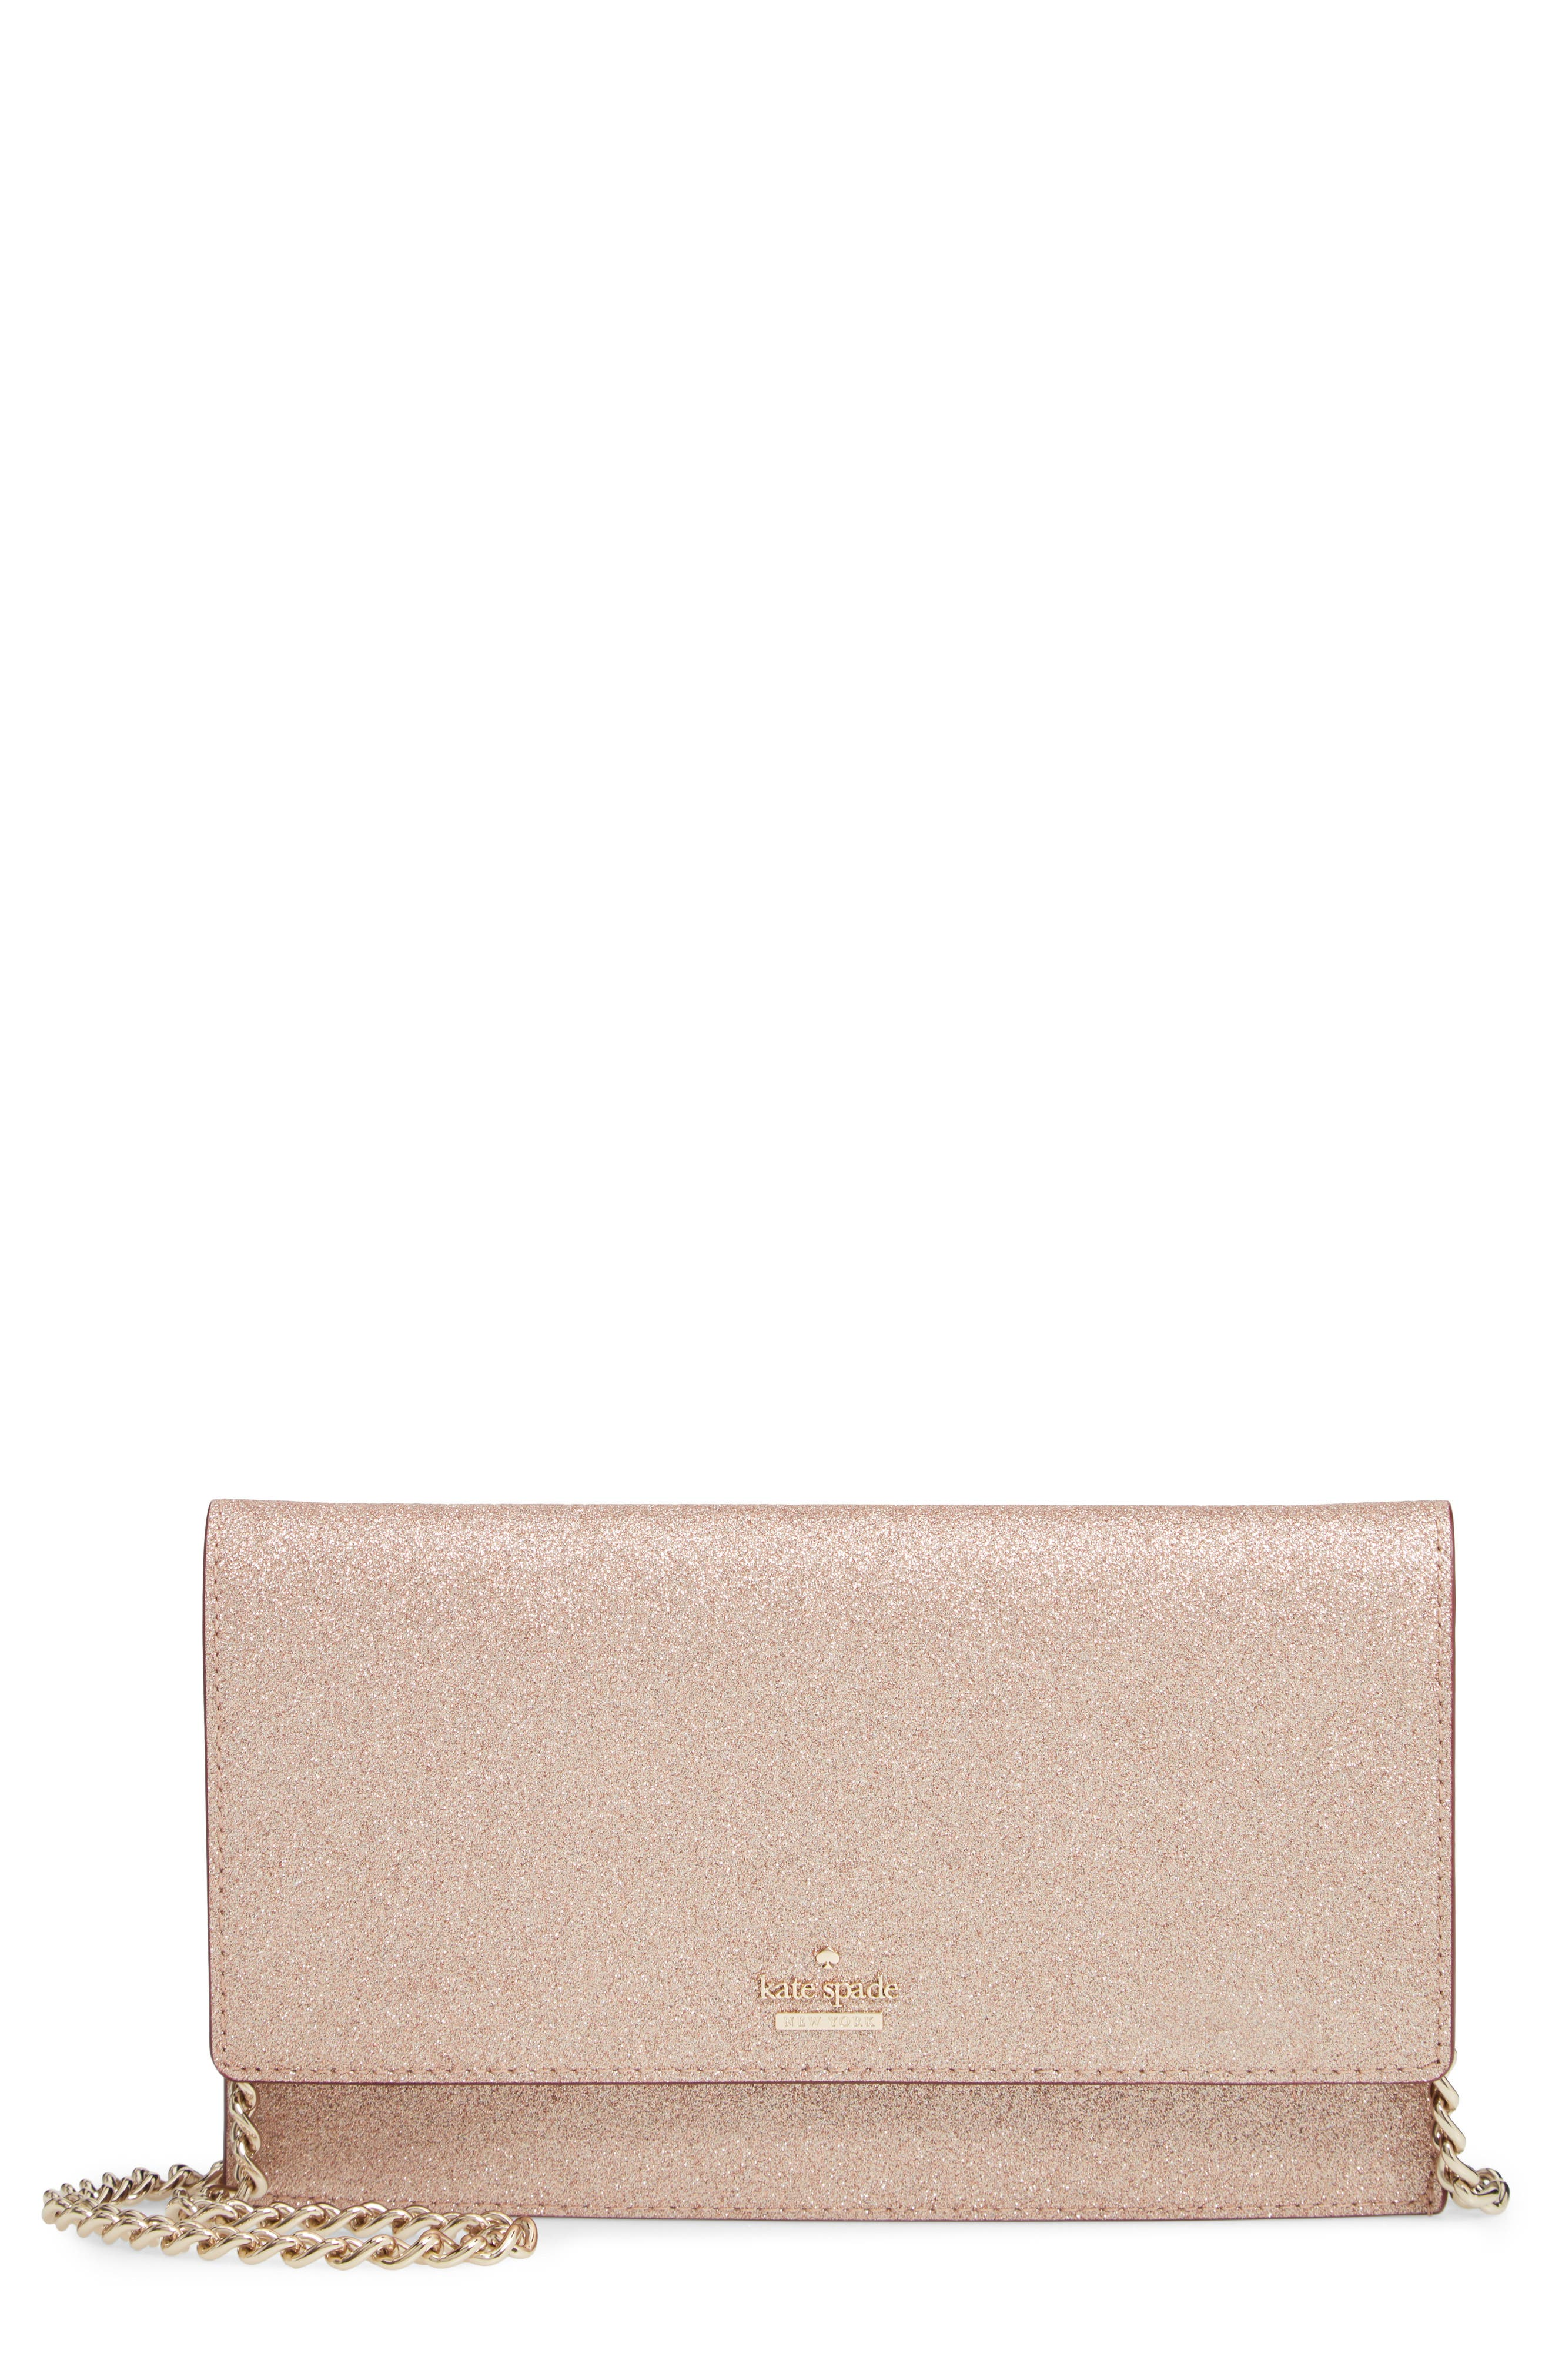 Kate Spade New York Womens Bags Hayden Pink Burgess Court Brennan Glitter Leather Crossbody Clutch